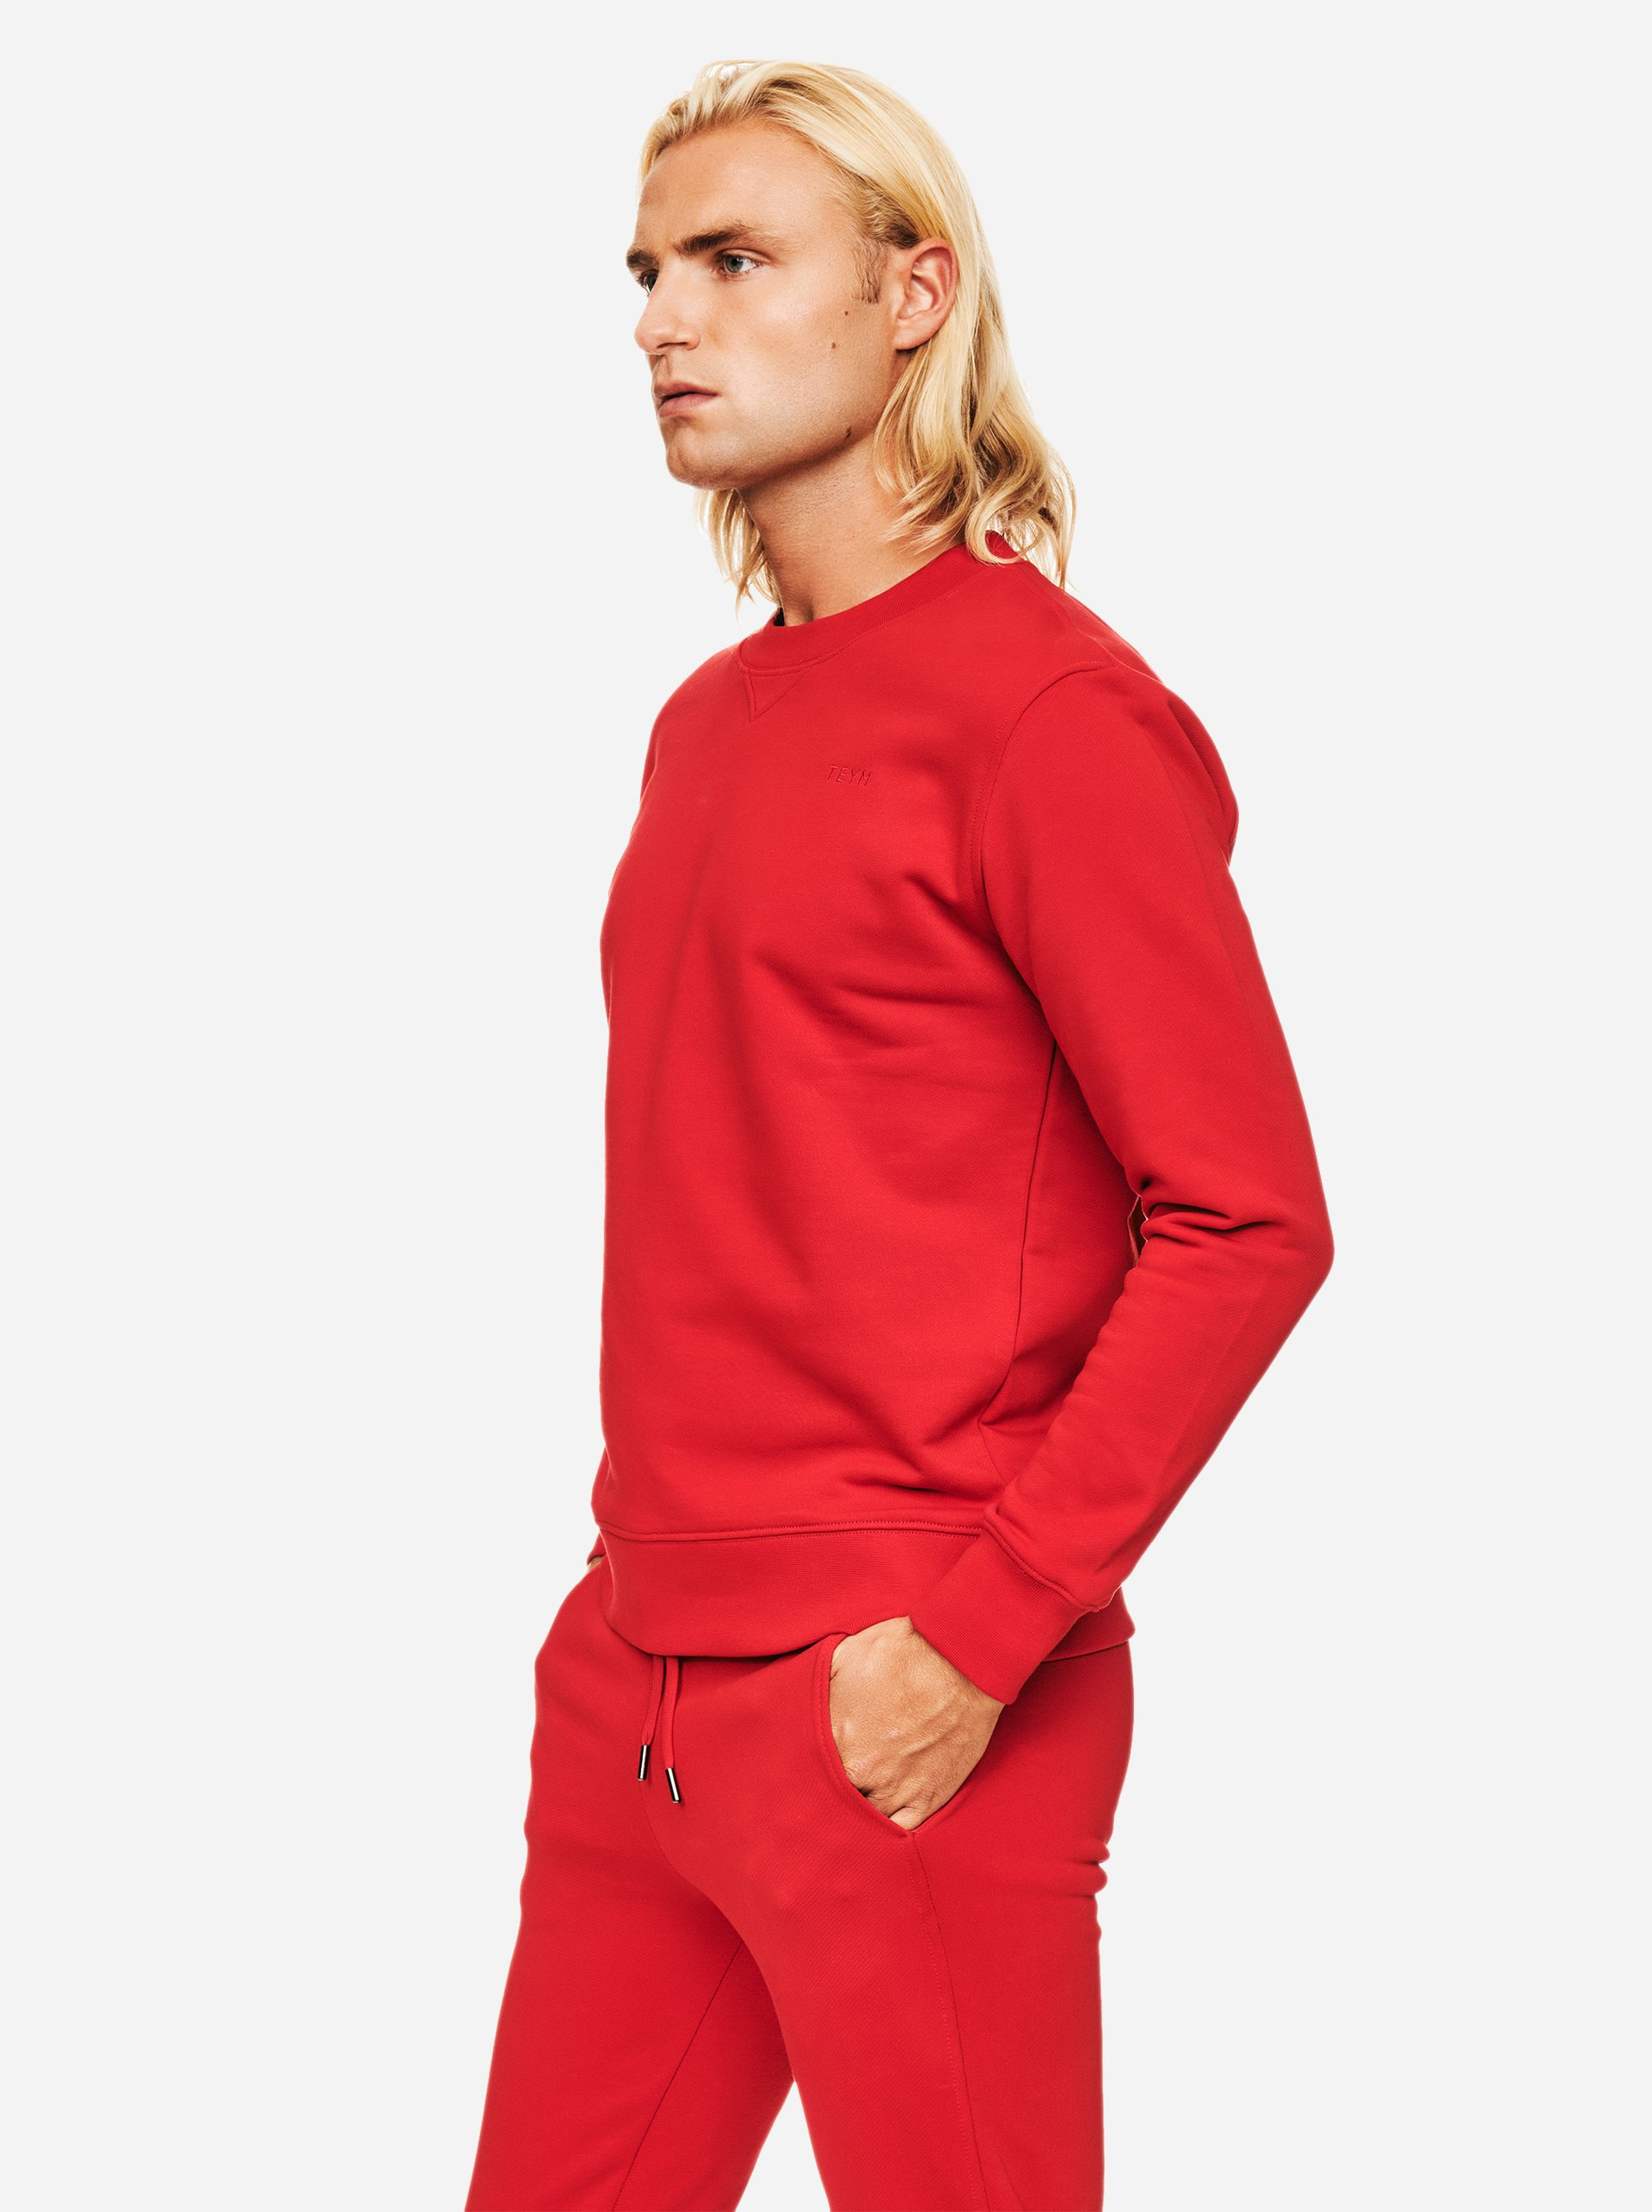 Teym-TheSweatshirt-Men-Red03